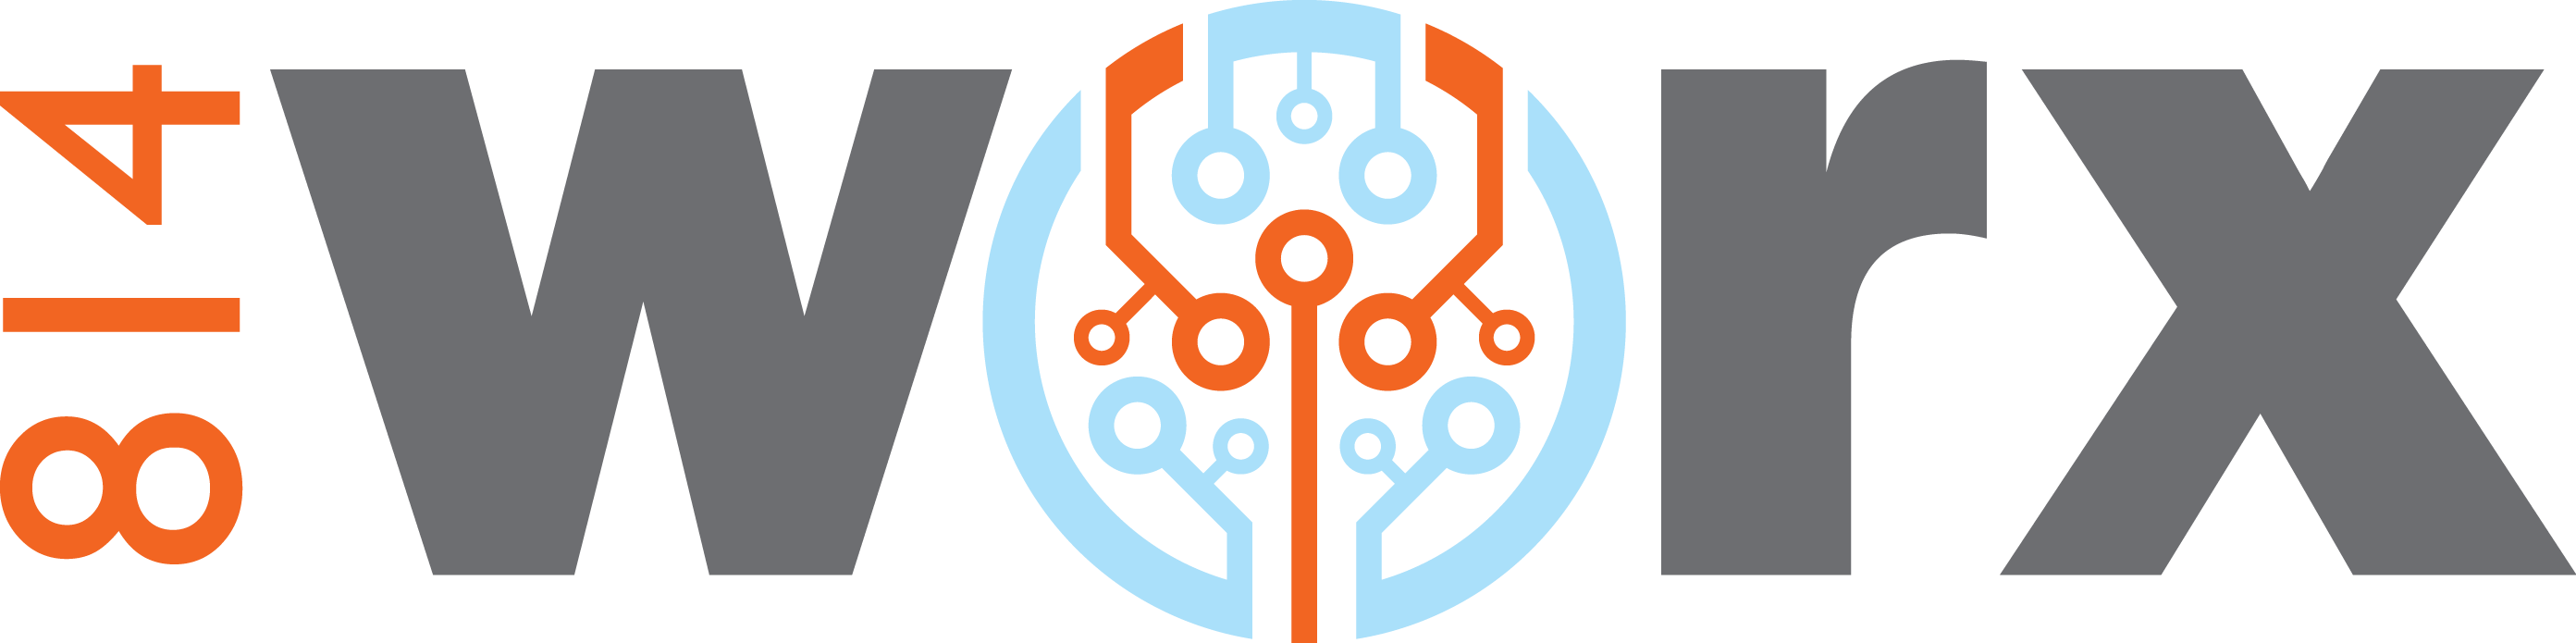 814 works logo